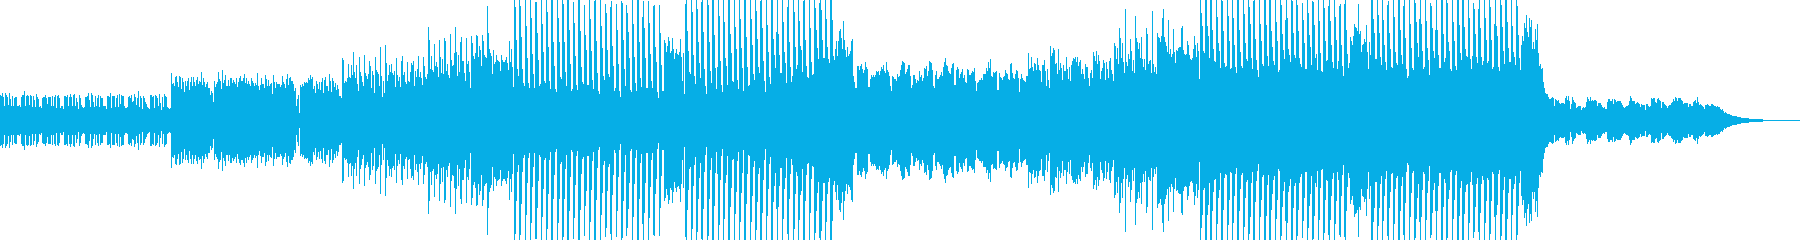 【EDM】モチベーションを上げる動画の再生済みの波形